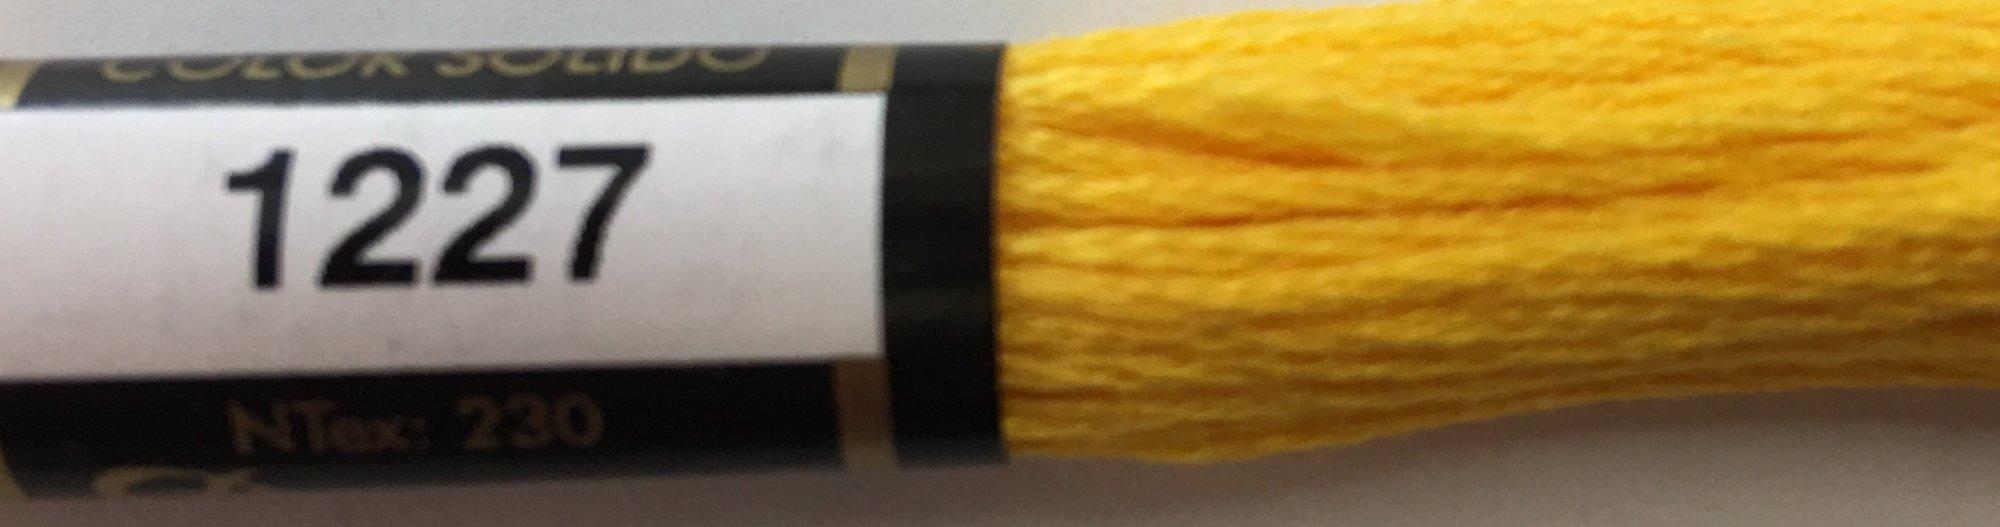 F1227 Presencia 100% Mercerized Finca Cotton 6 ply Embroidery Floss 8 meter skein